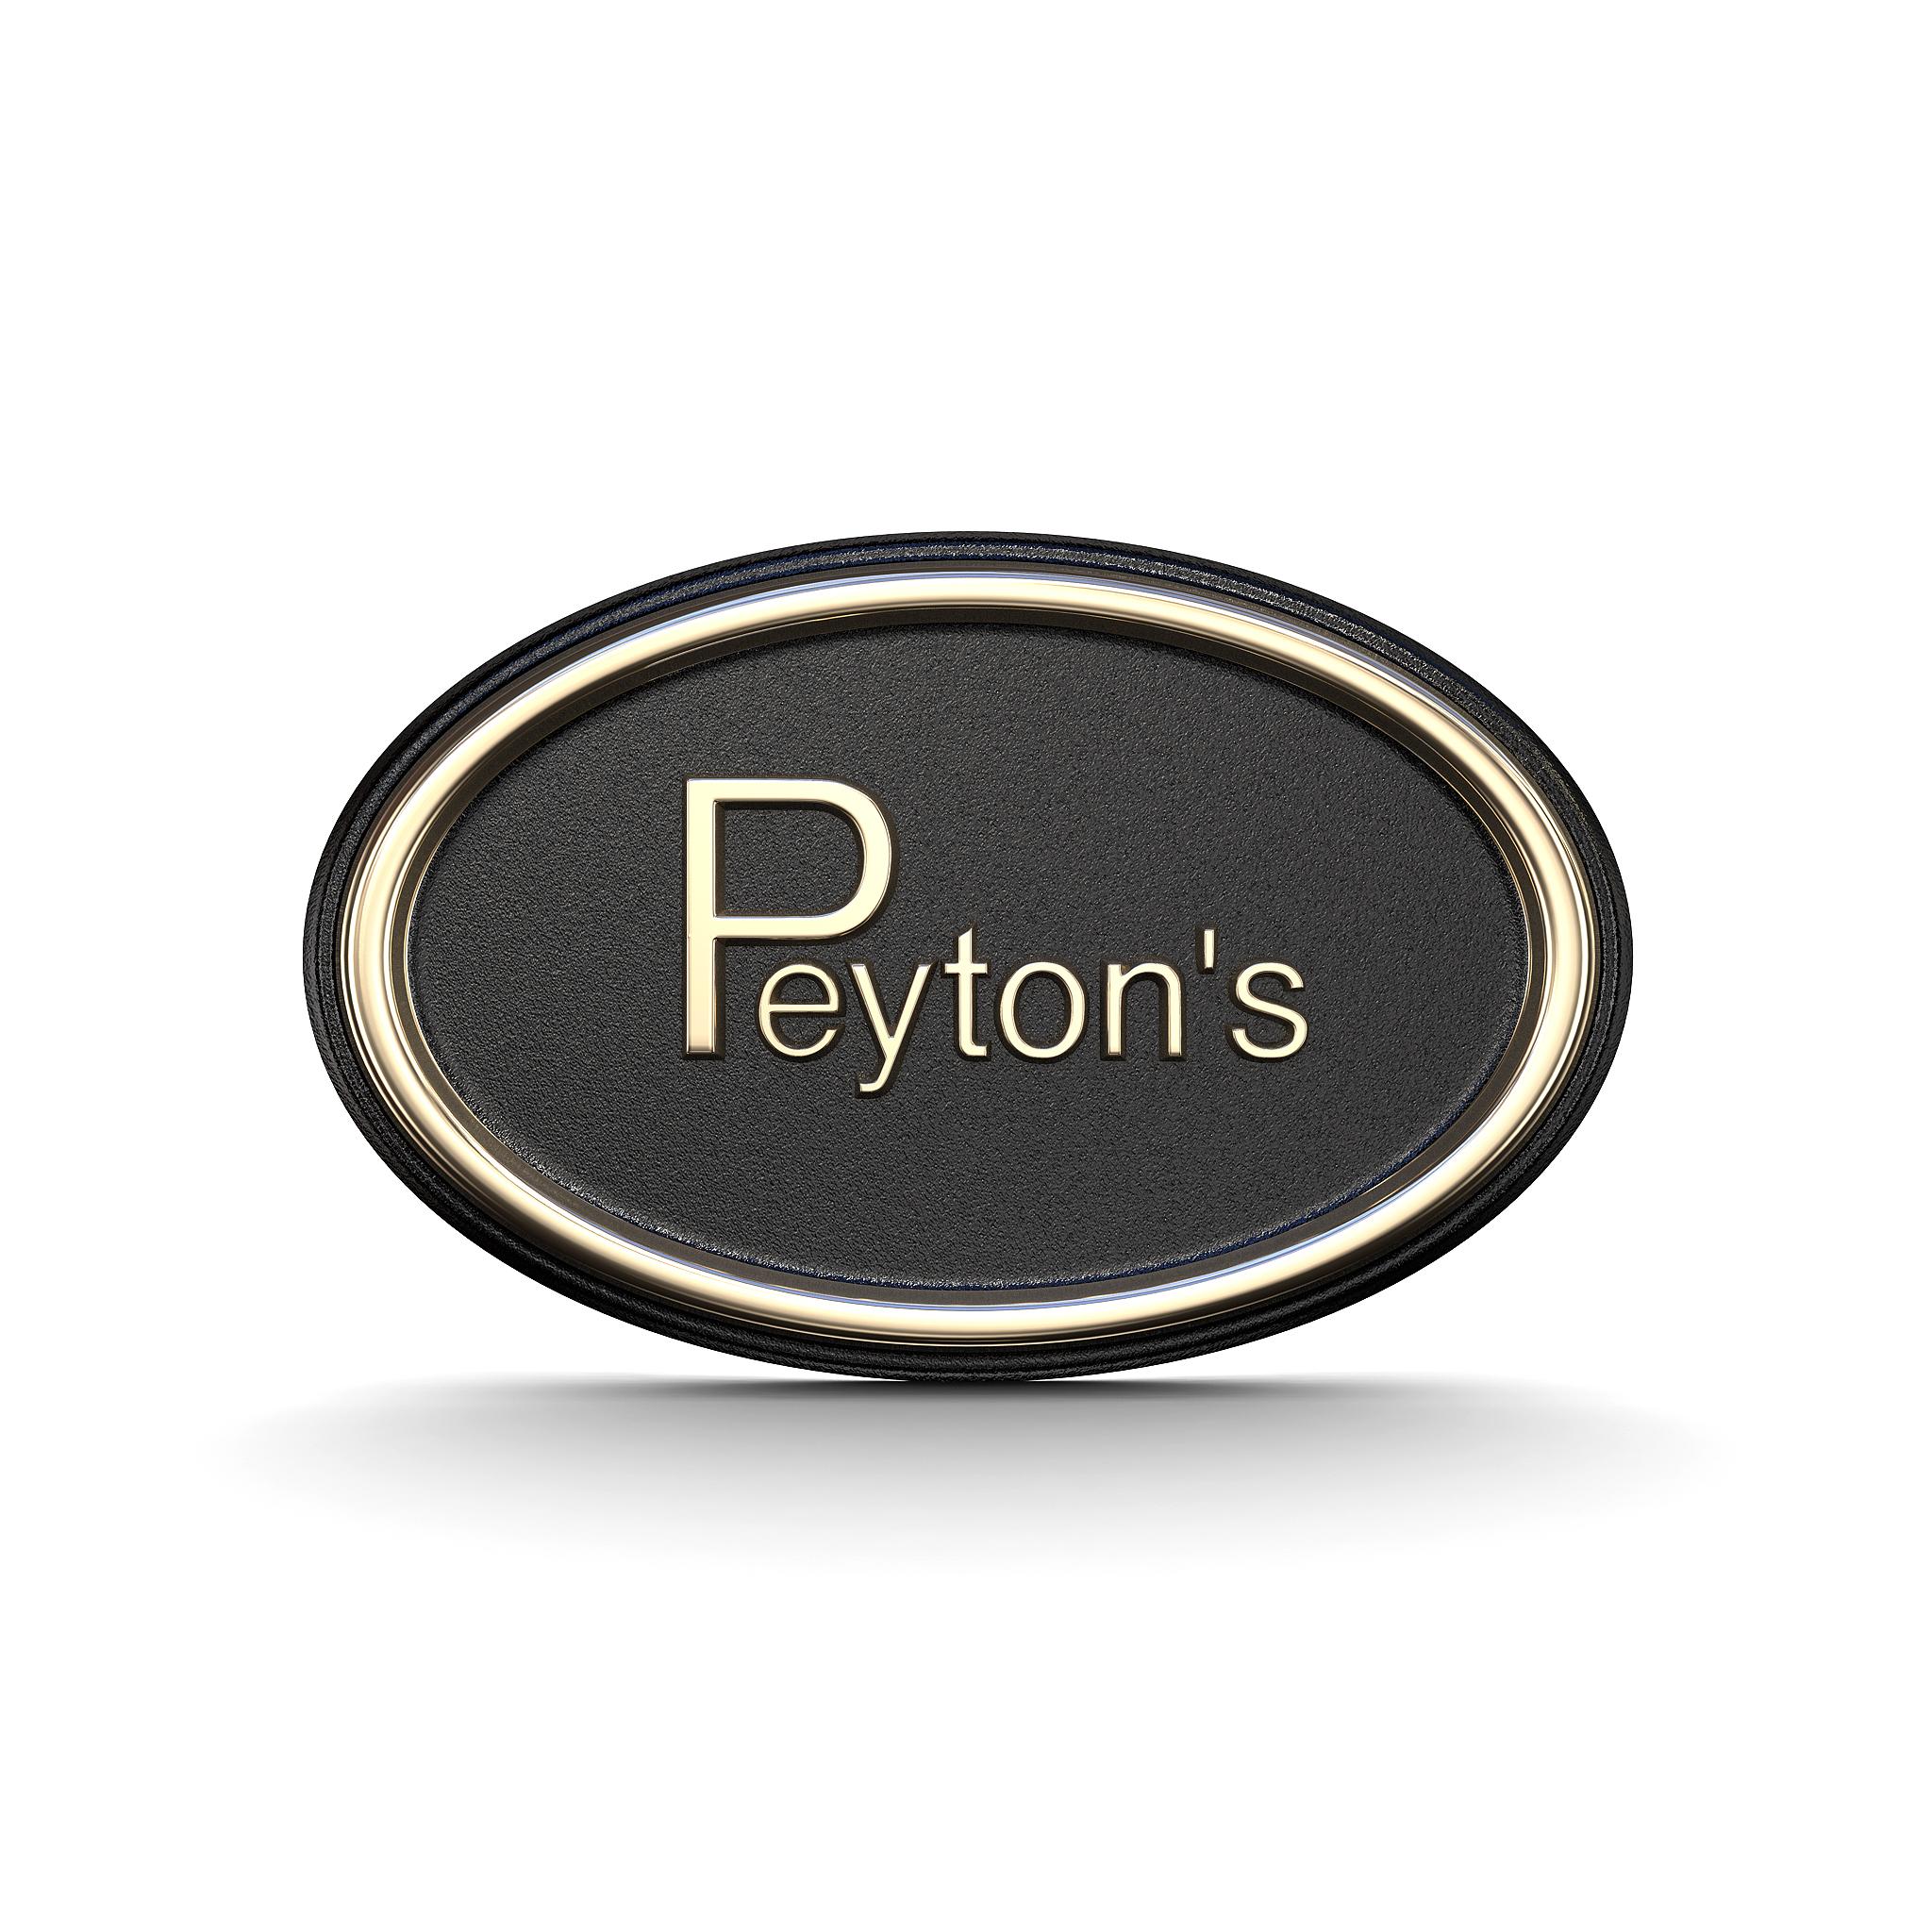 Paytons.jpg